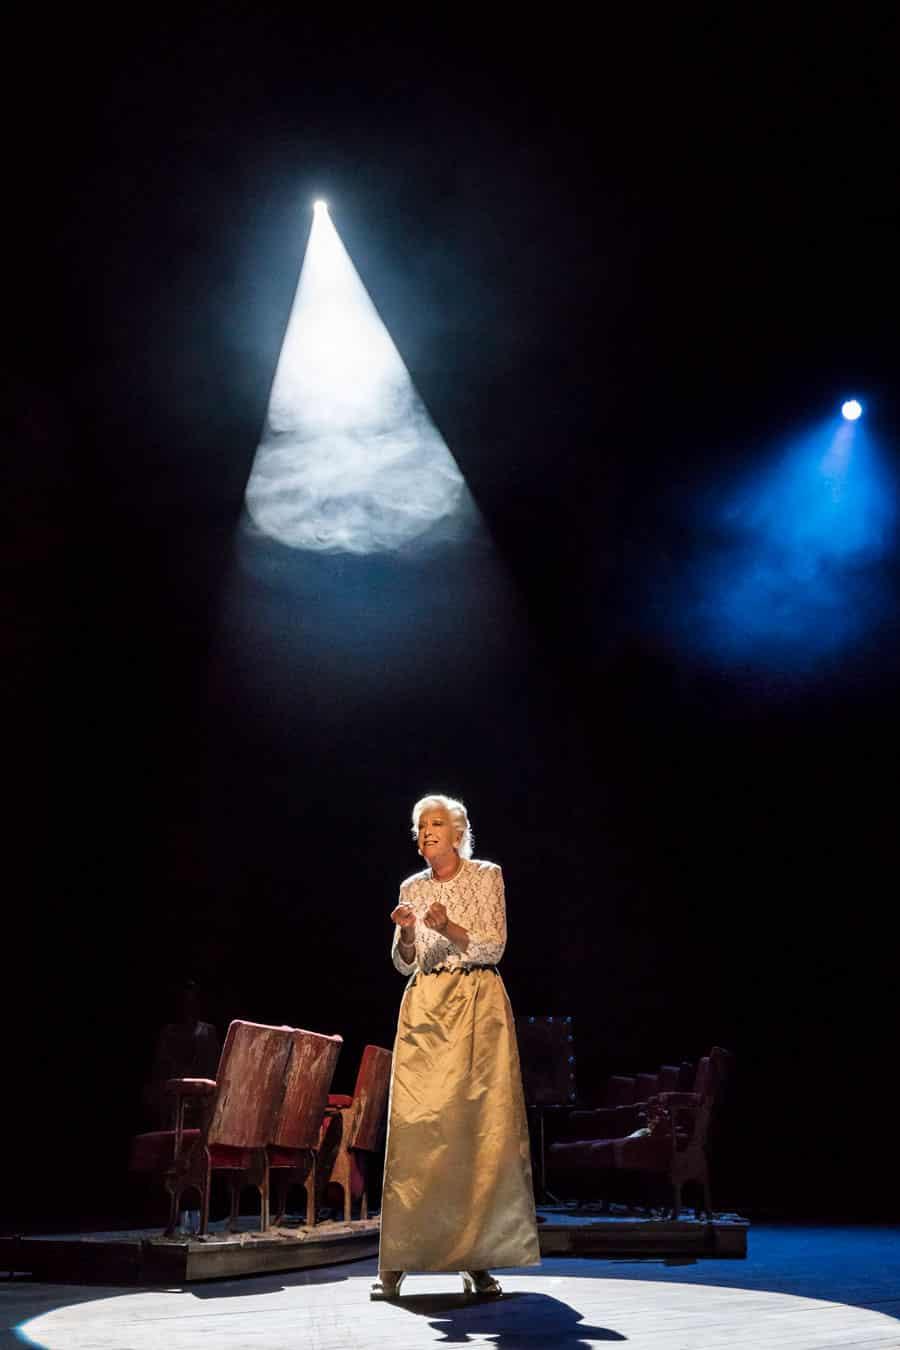 Stephen Sondheim's Follies at National Theatre